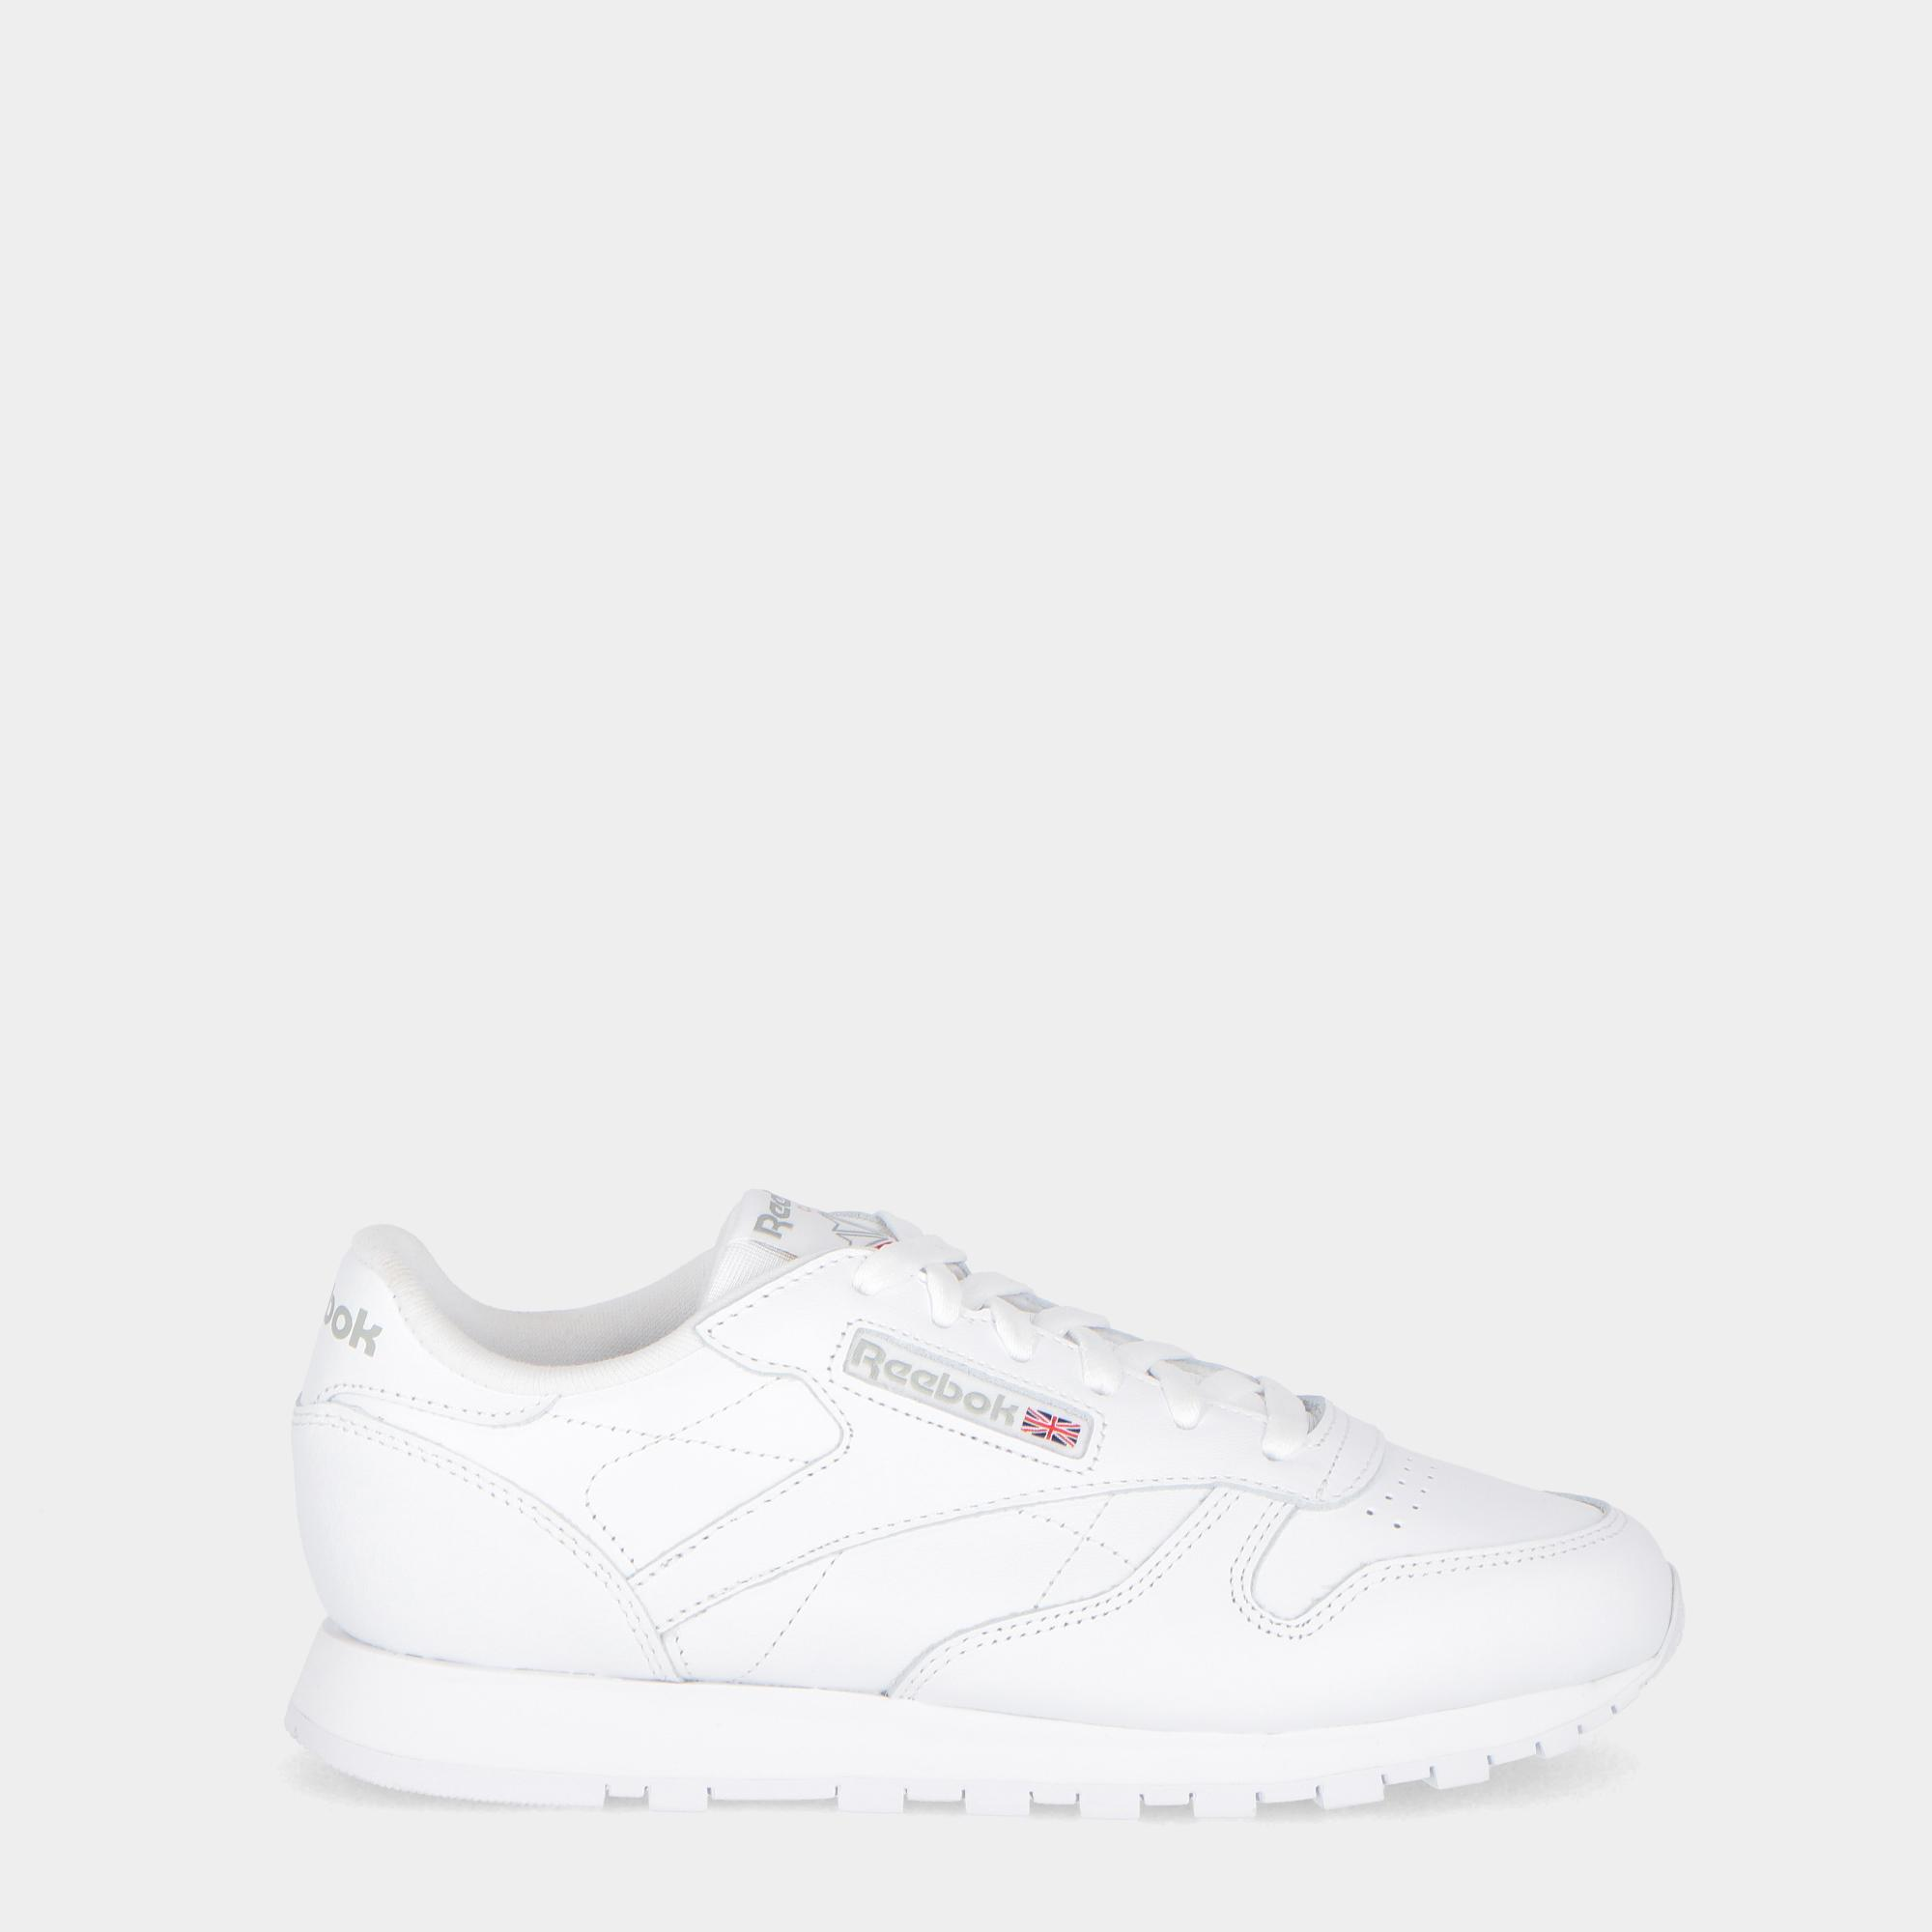 c0a117c2e3b Reebok Classic Leather White | Treesse